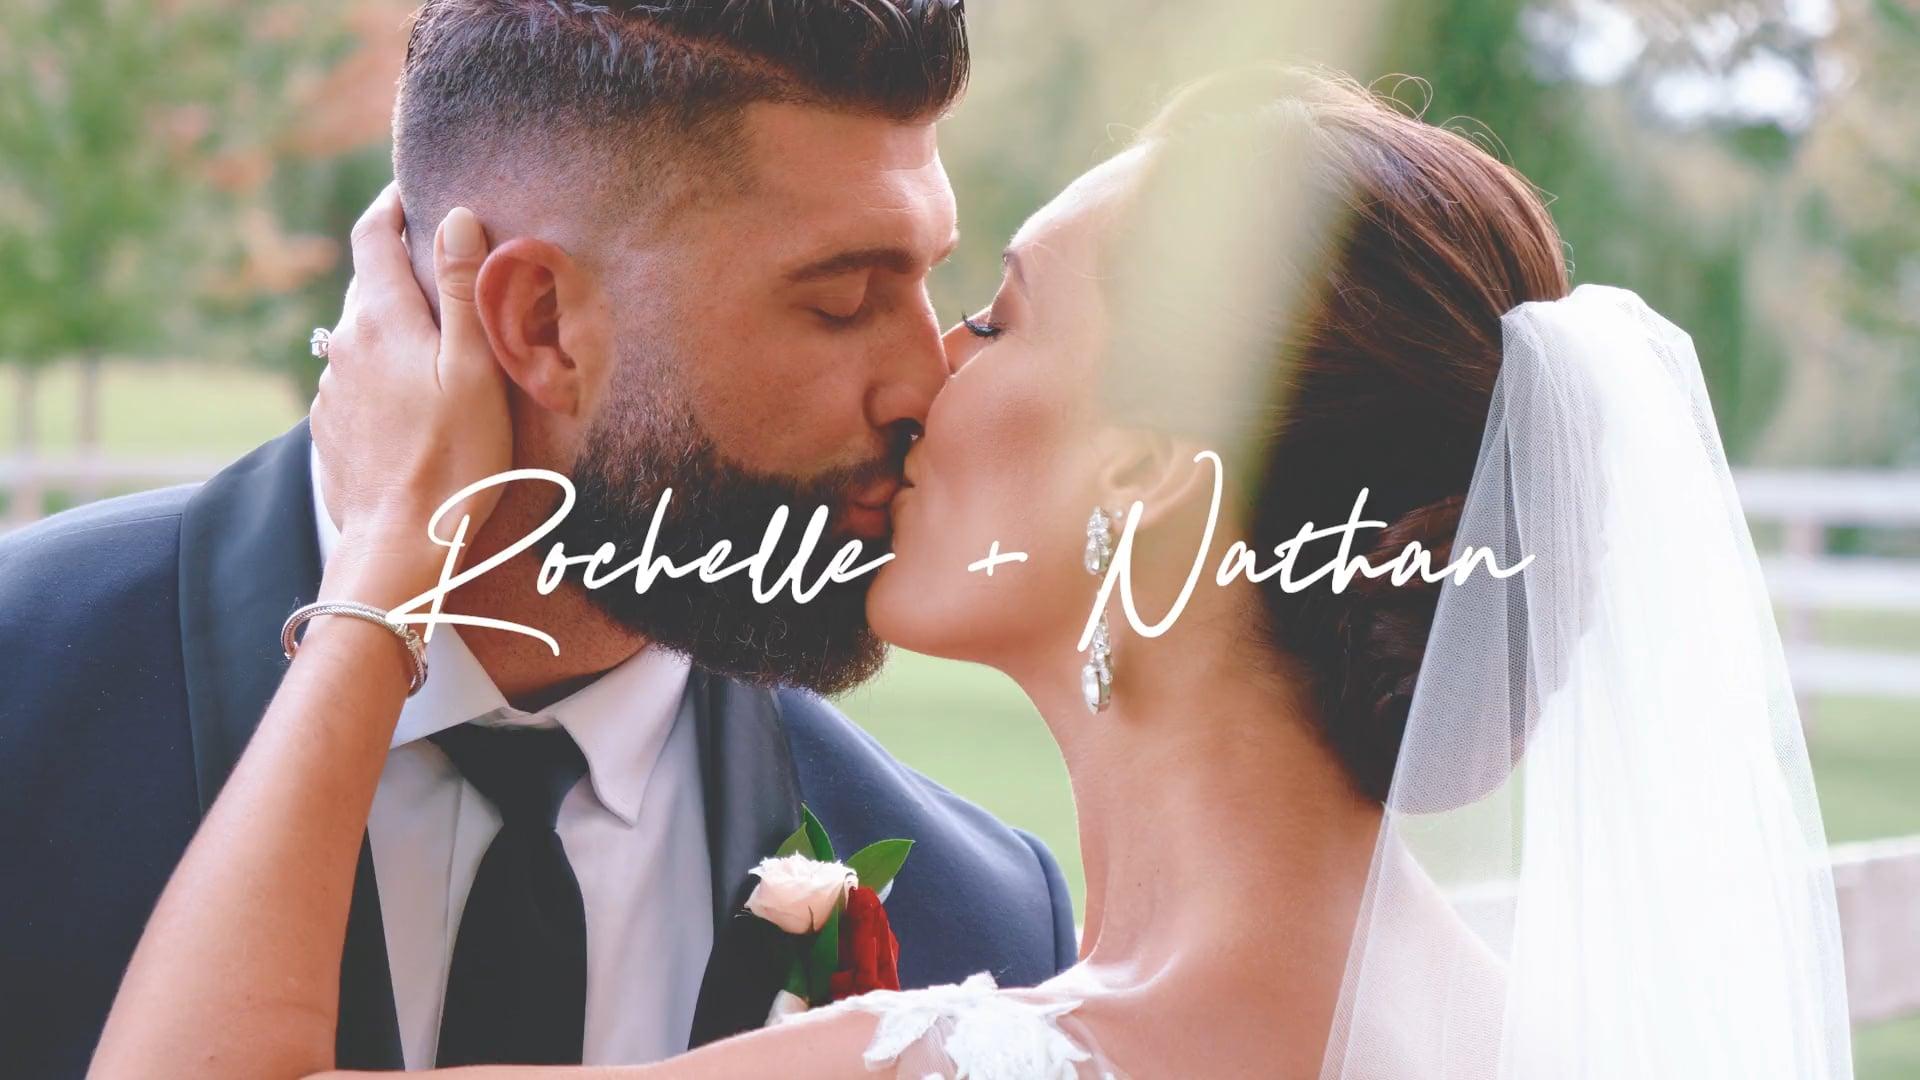 Rochelle + Nathan Wedding Highlight Film